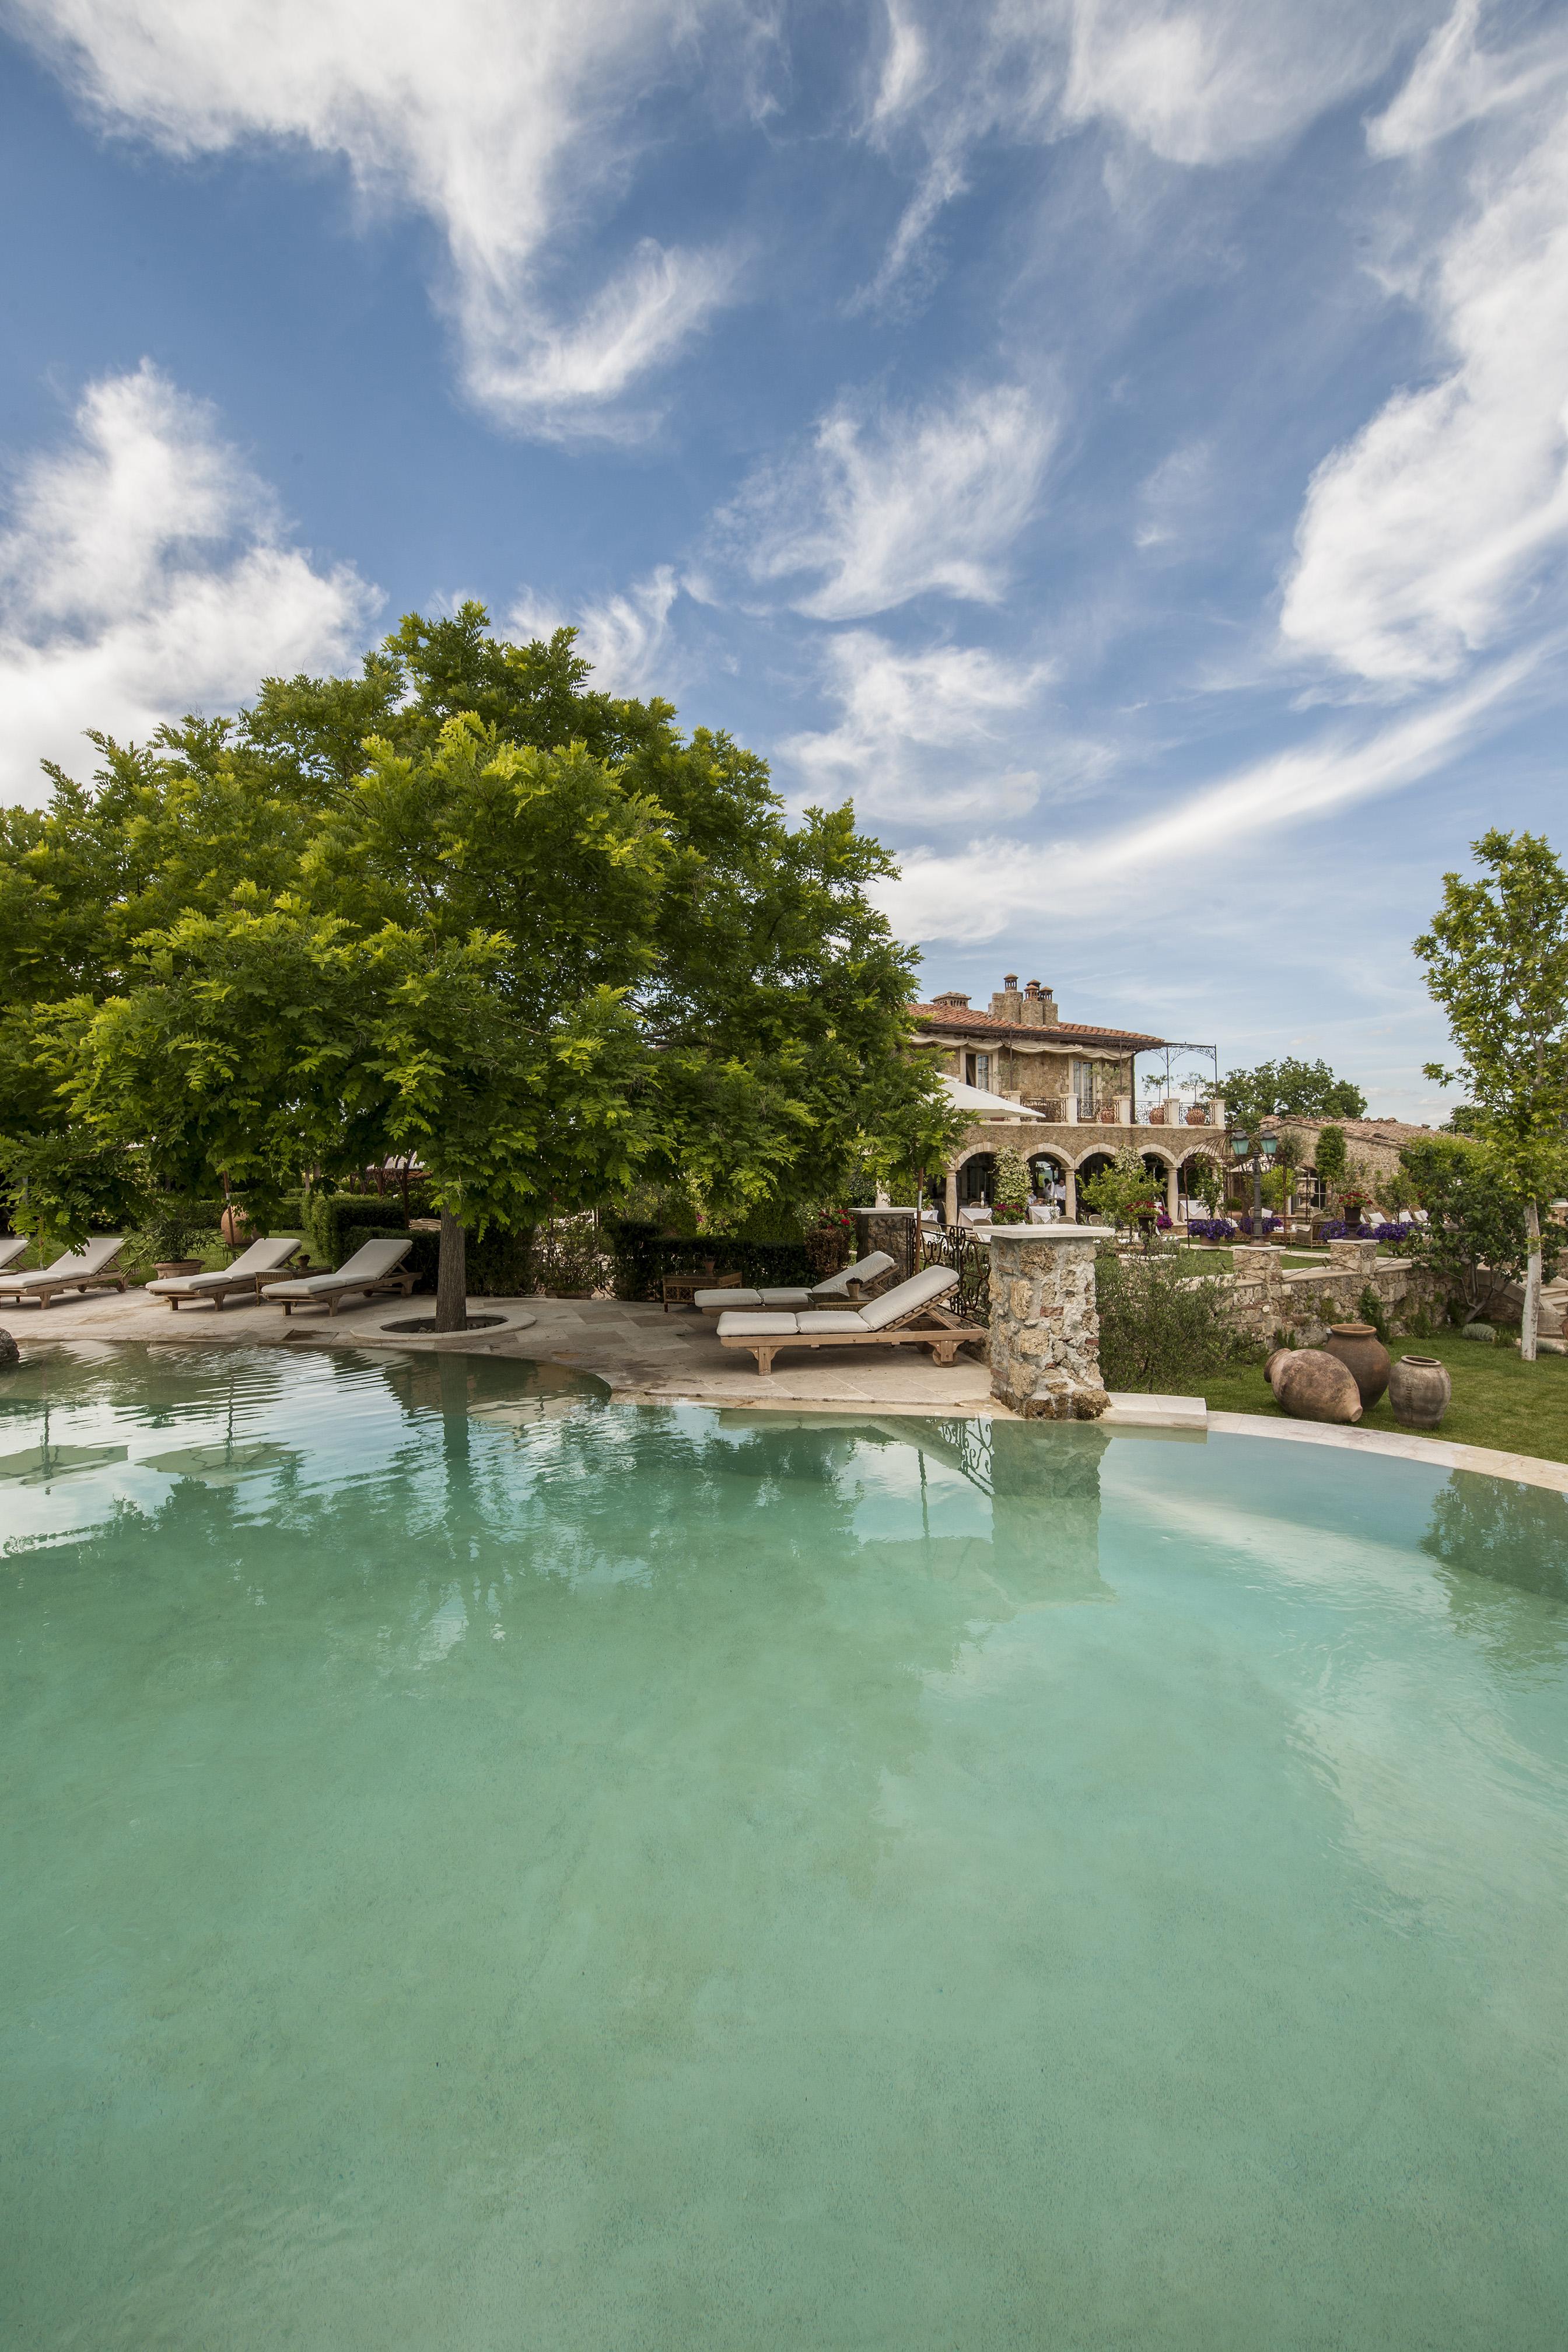 Plan a Dream Wedding at the Borgo Santo Pietro in Tuscany